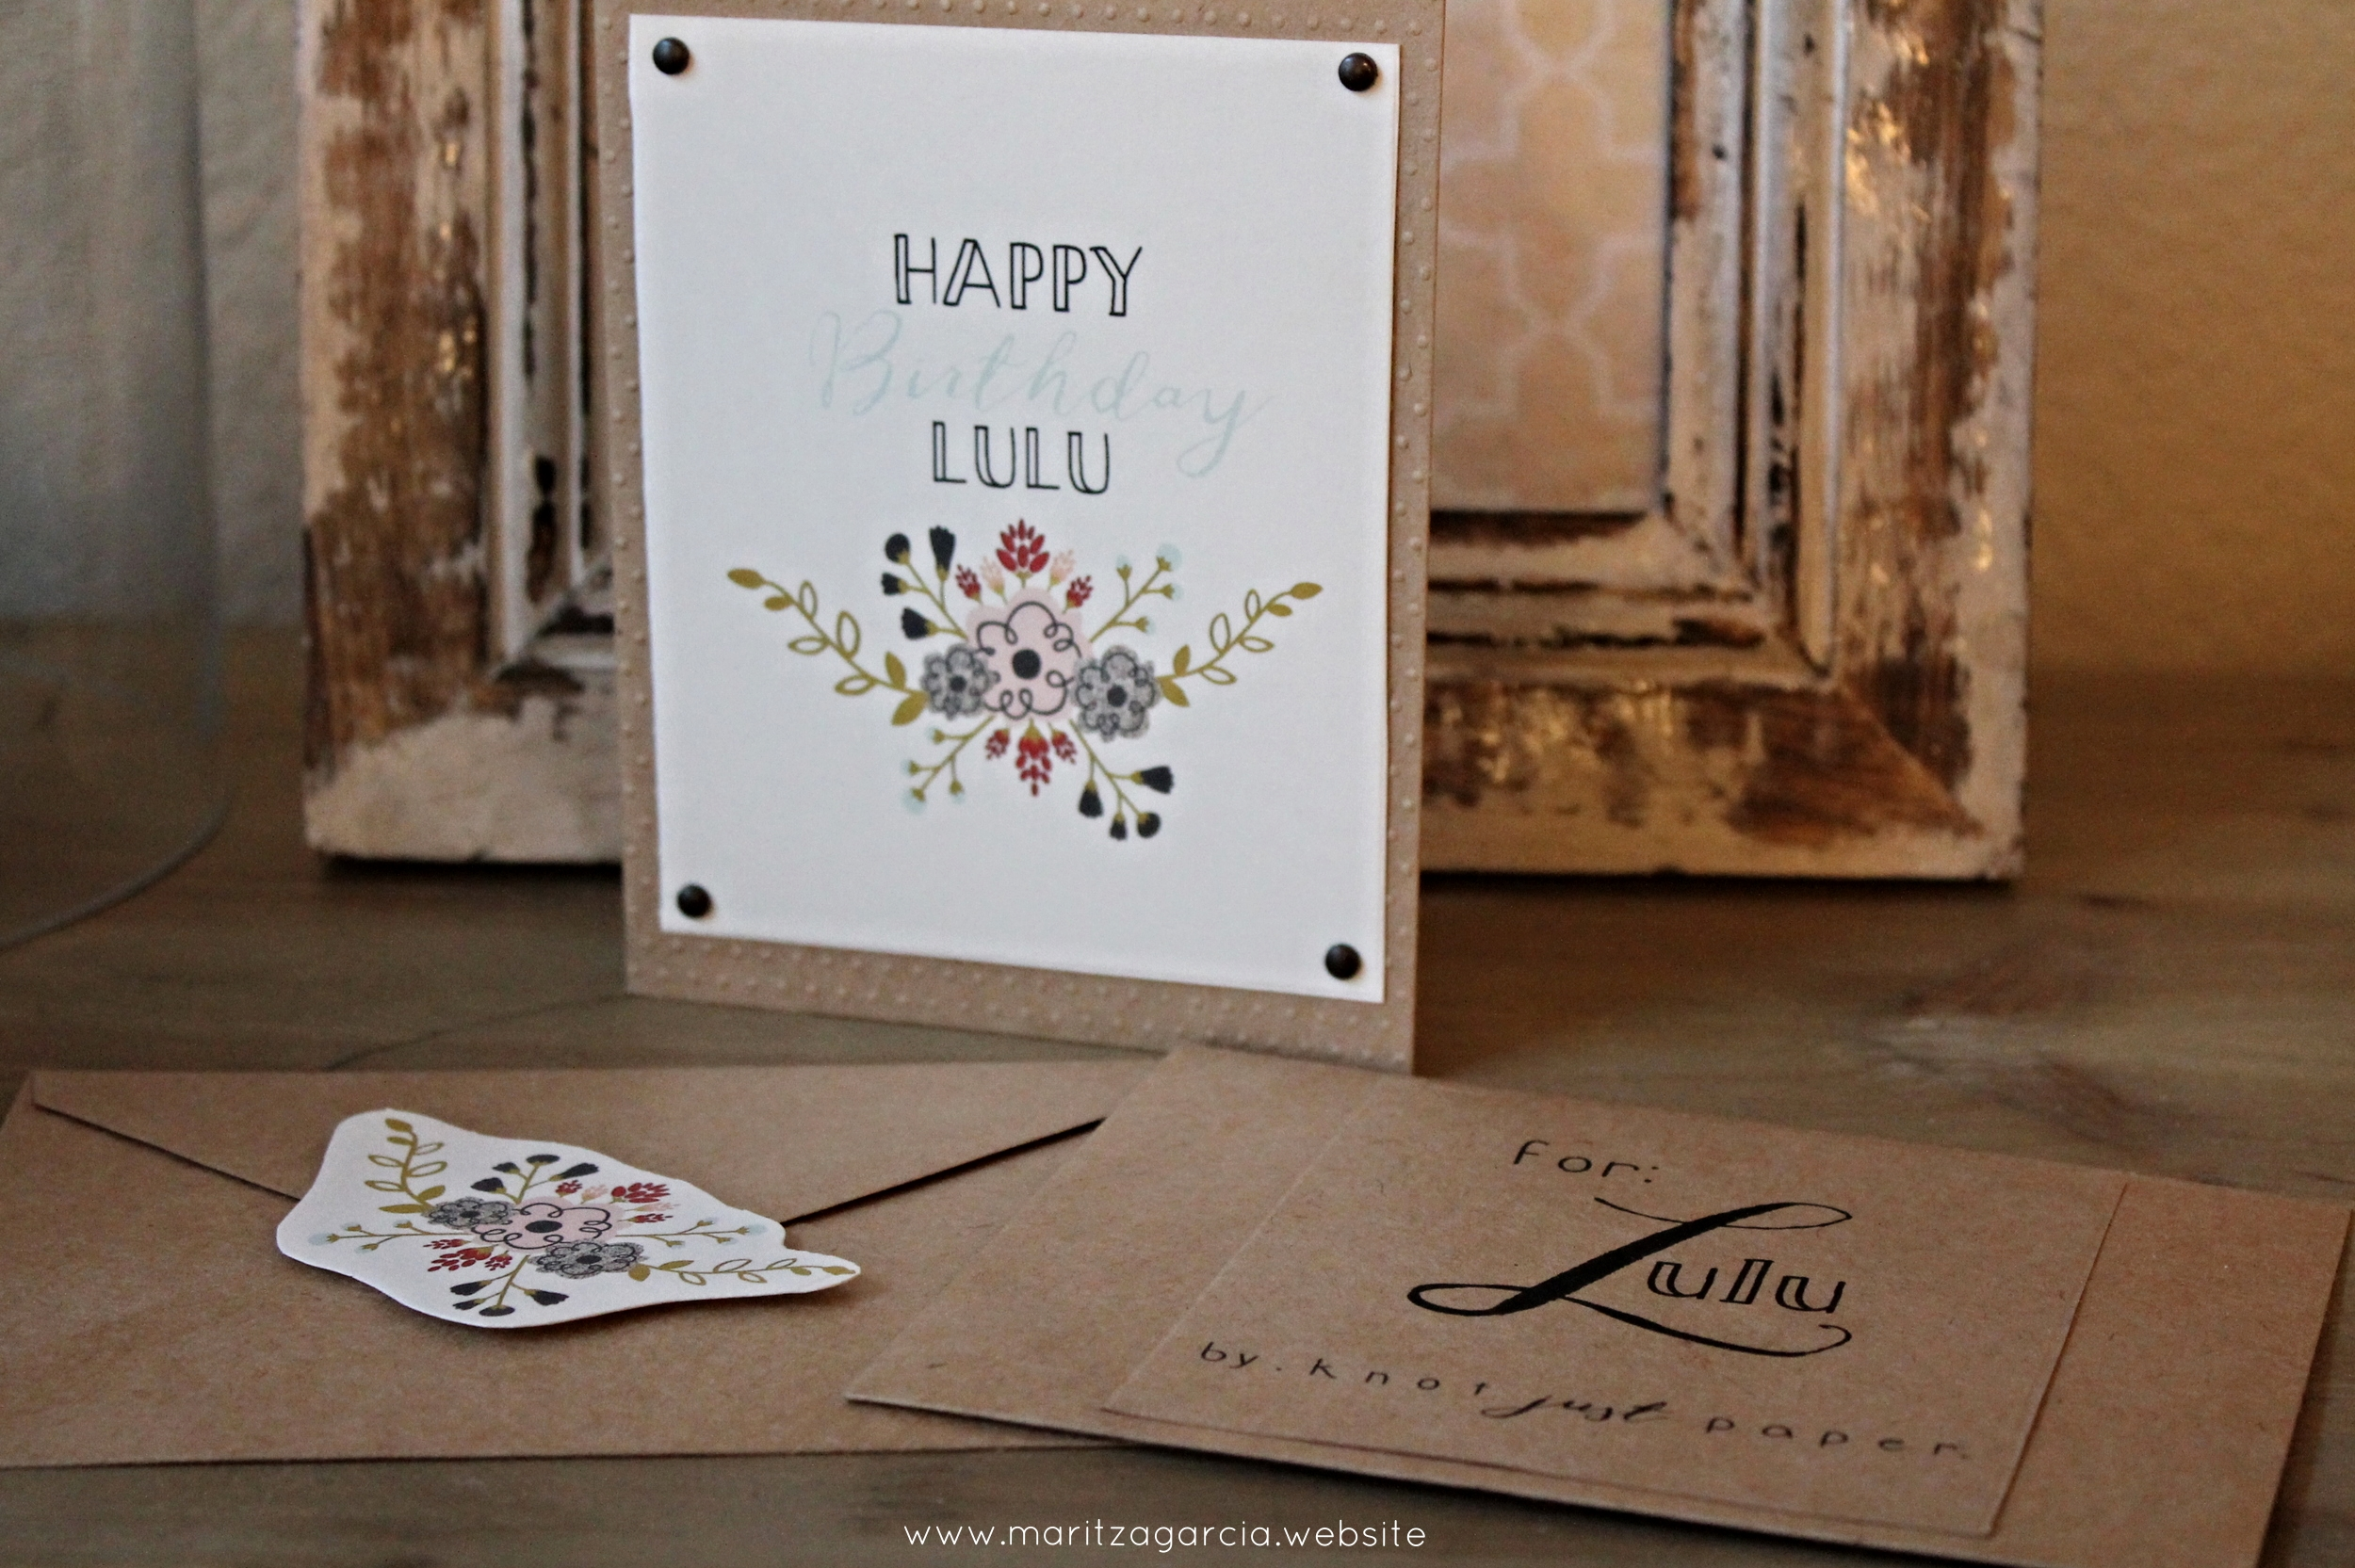 Personalized Floral Birthday Card by Maritza Garcia.